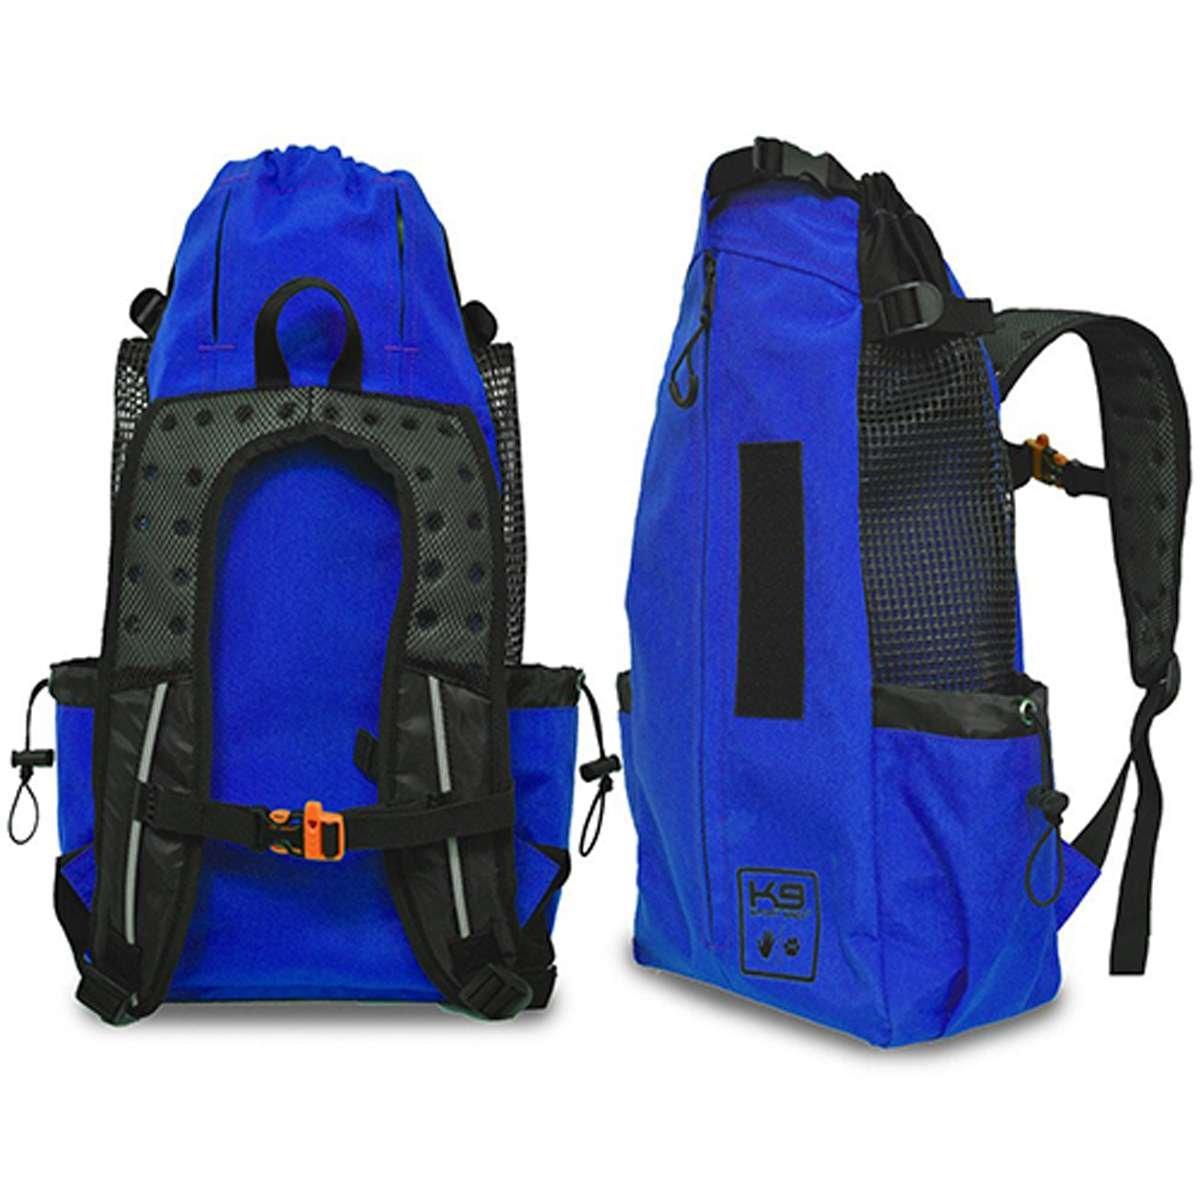 K9 SPORT SACK AIR IN COBALT BLUE